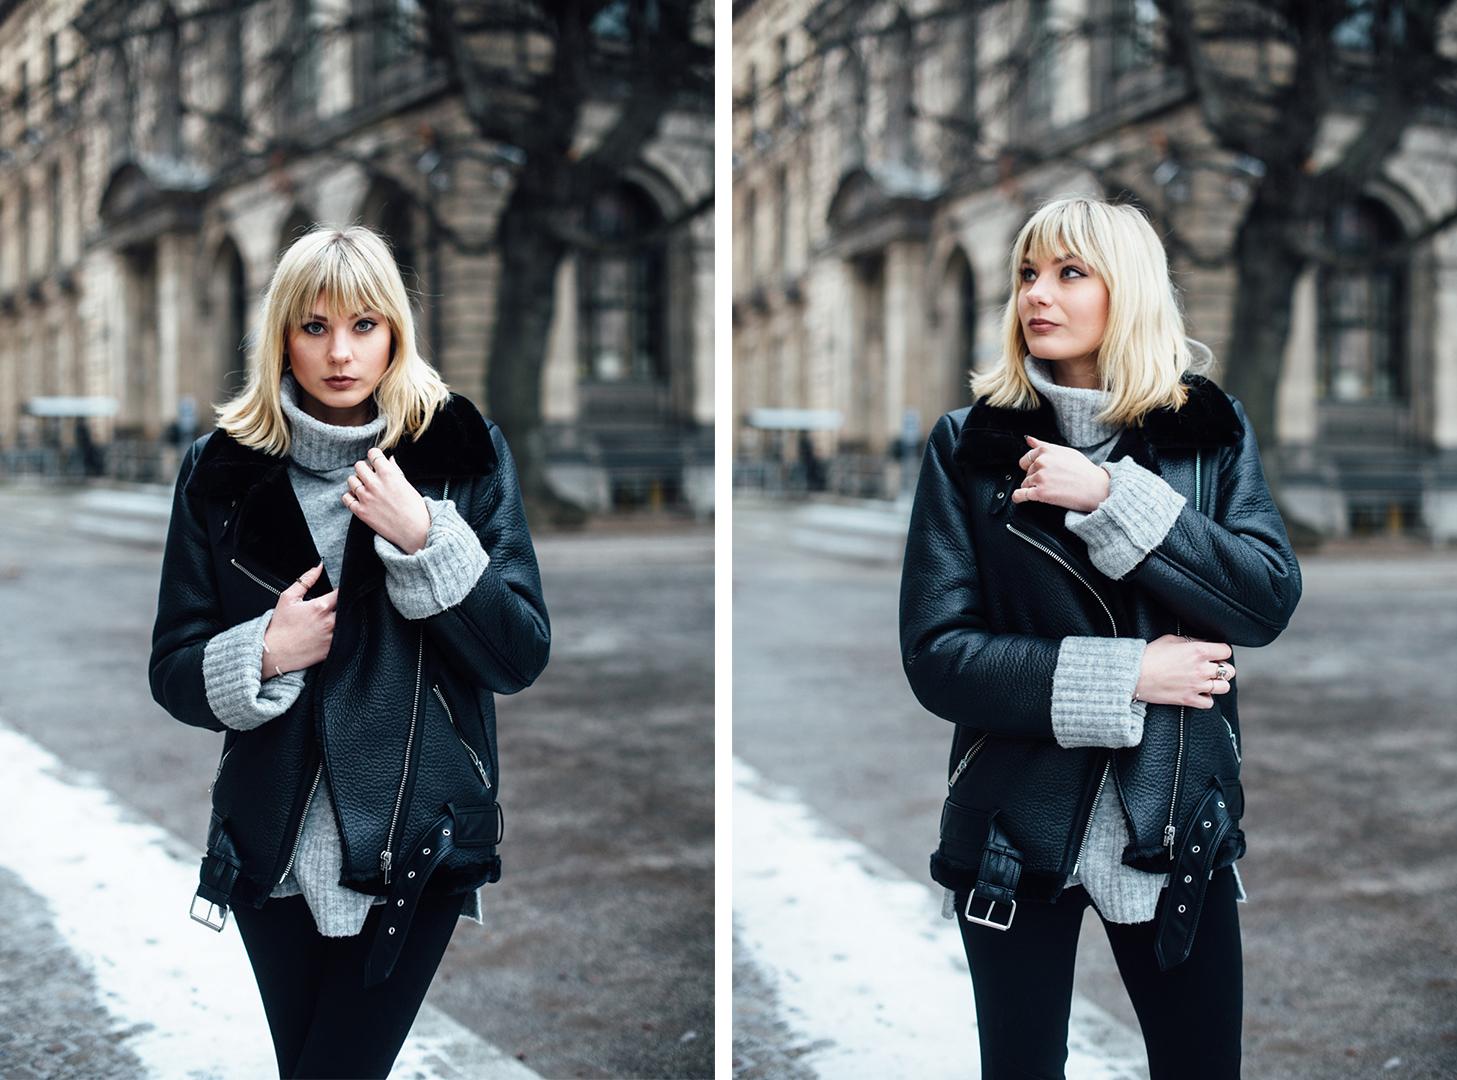 04-Kiamisu-Modeblog-Fashion Week Berlin_Shearling Jacke-collage